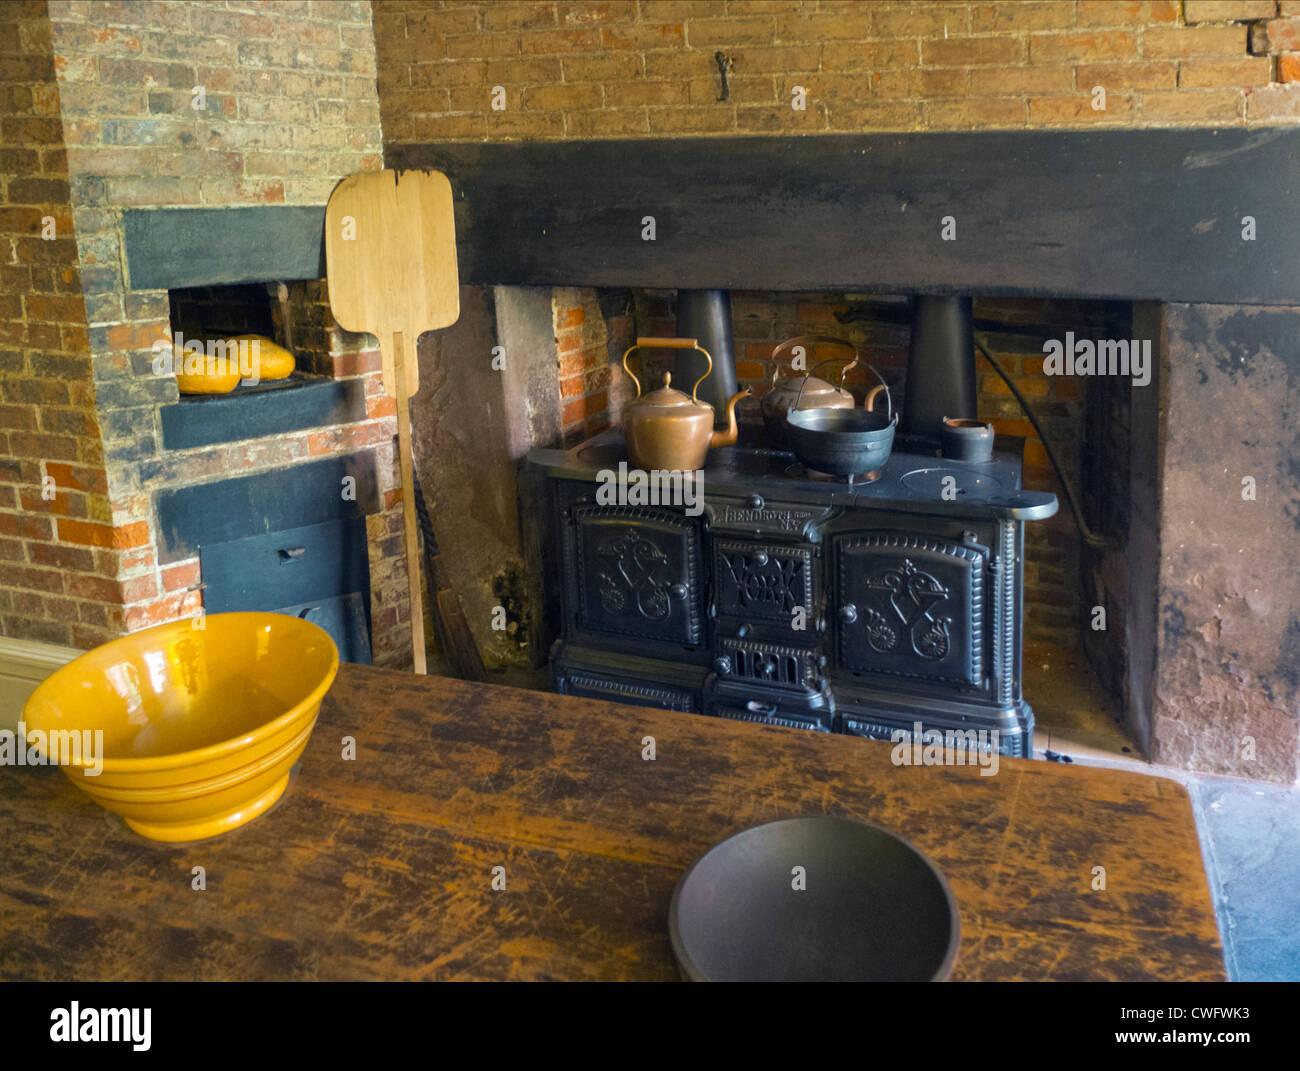 Händler Haus-Museum in New York City Stockfoto, Bild: 50136551 - Alamy